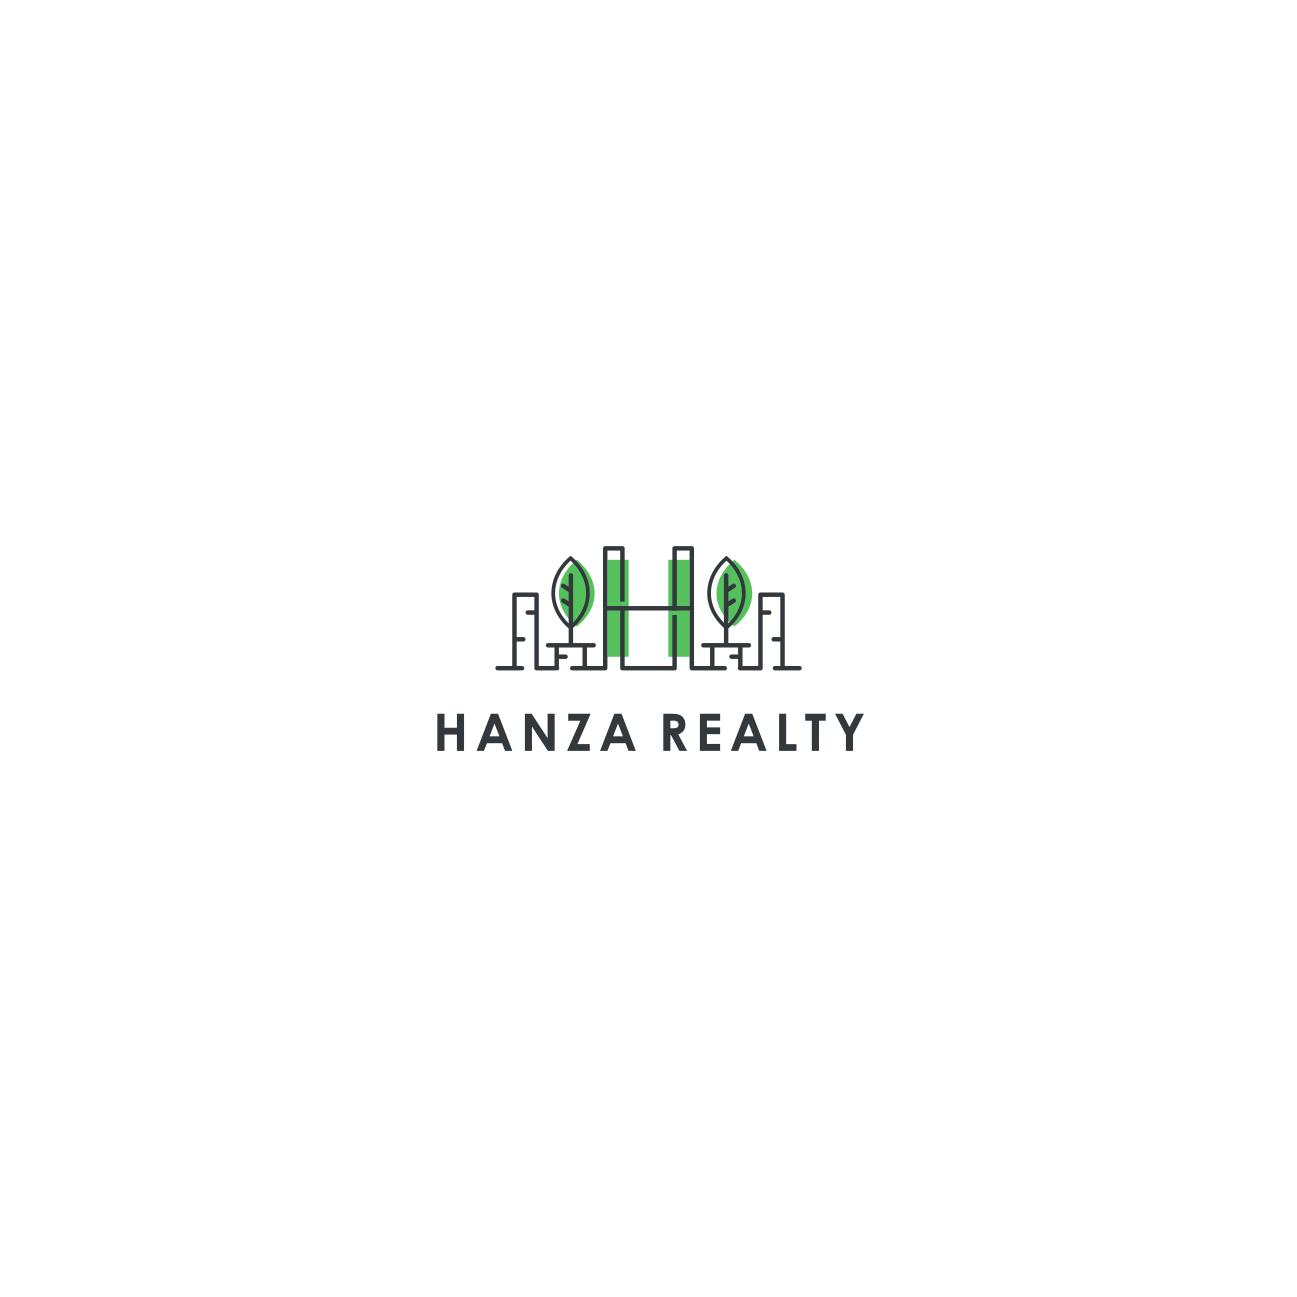 Logo Design by Balya ibnu Bi malkan - Entry No. 441 in the Logo Design Contest Logo Design for Hanza Realty.